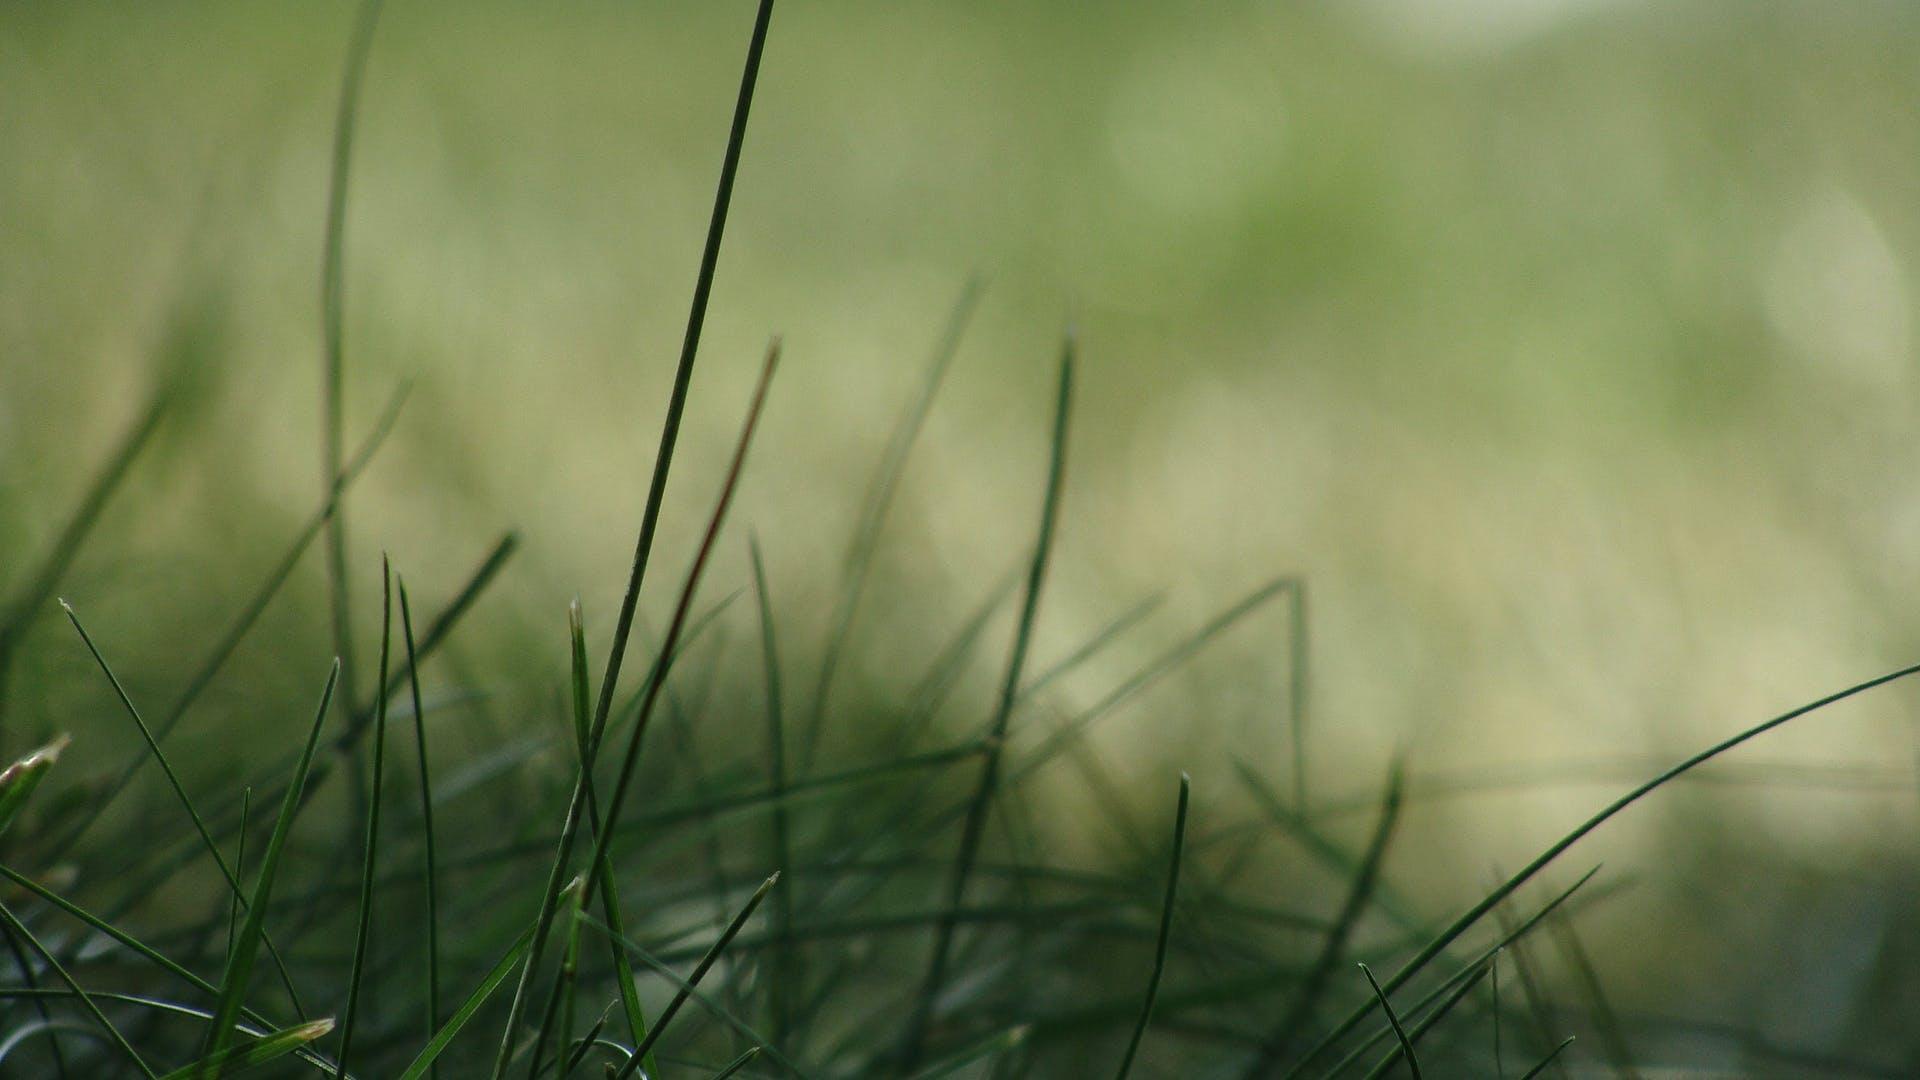 Kostenloses Stock Foto zu gras, grün, makro, pflanze